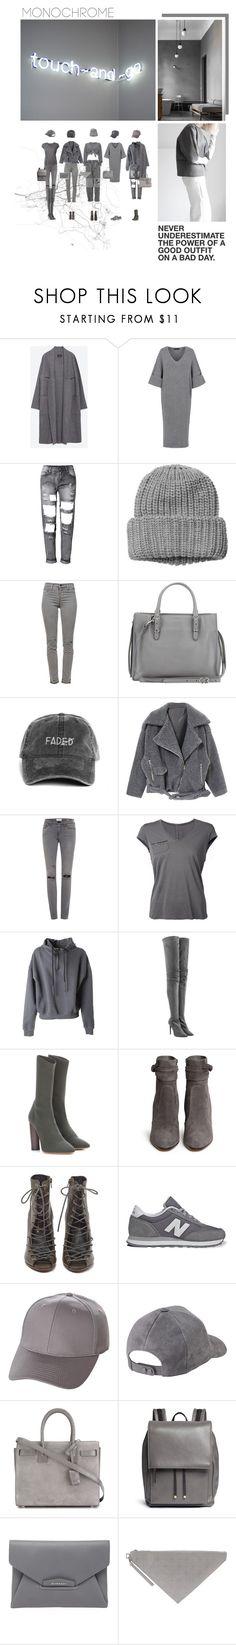 """[g r e y day]"" by furhious ❤ liked on Polyvore featuring Zara, Ashish, Jil Sander Navy, Monki, J Brand, Balenciaga, Frame, TRANSIT, adidas Originals and Tamara Mellon"